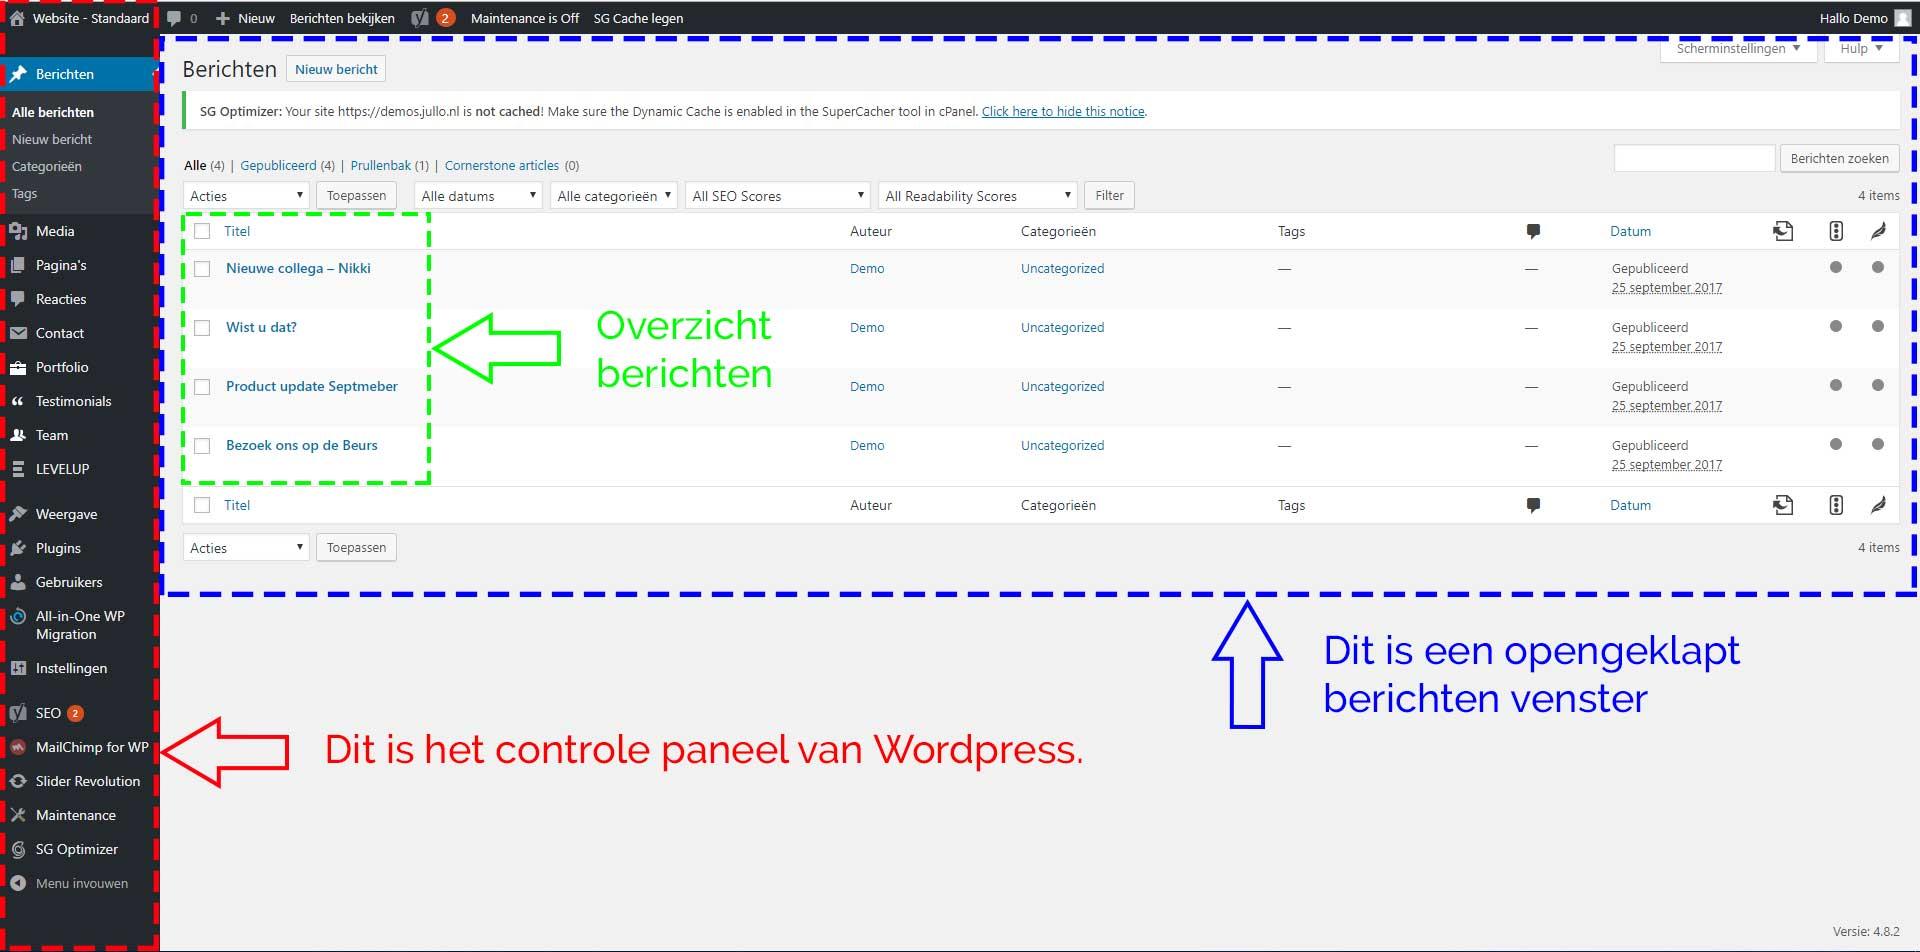 WordPress-dashboard-inleiding